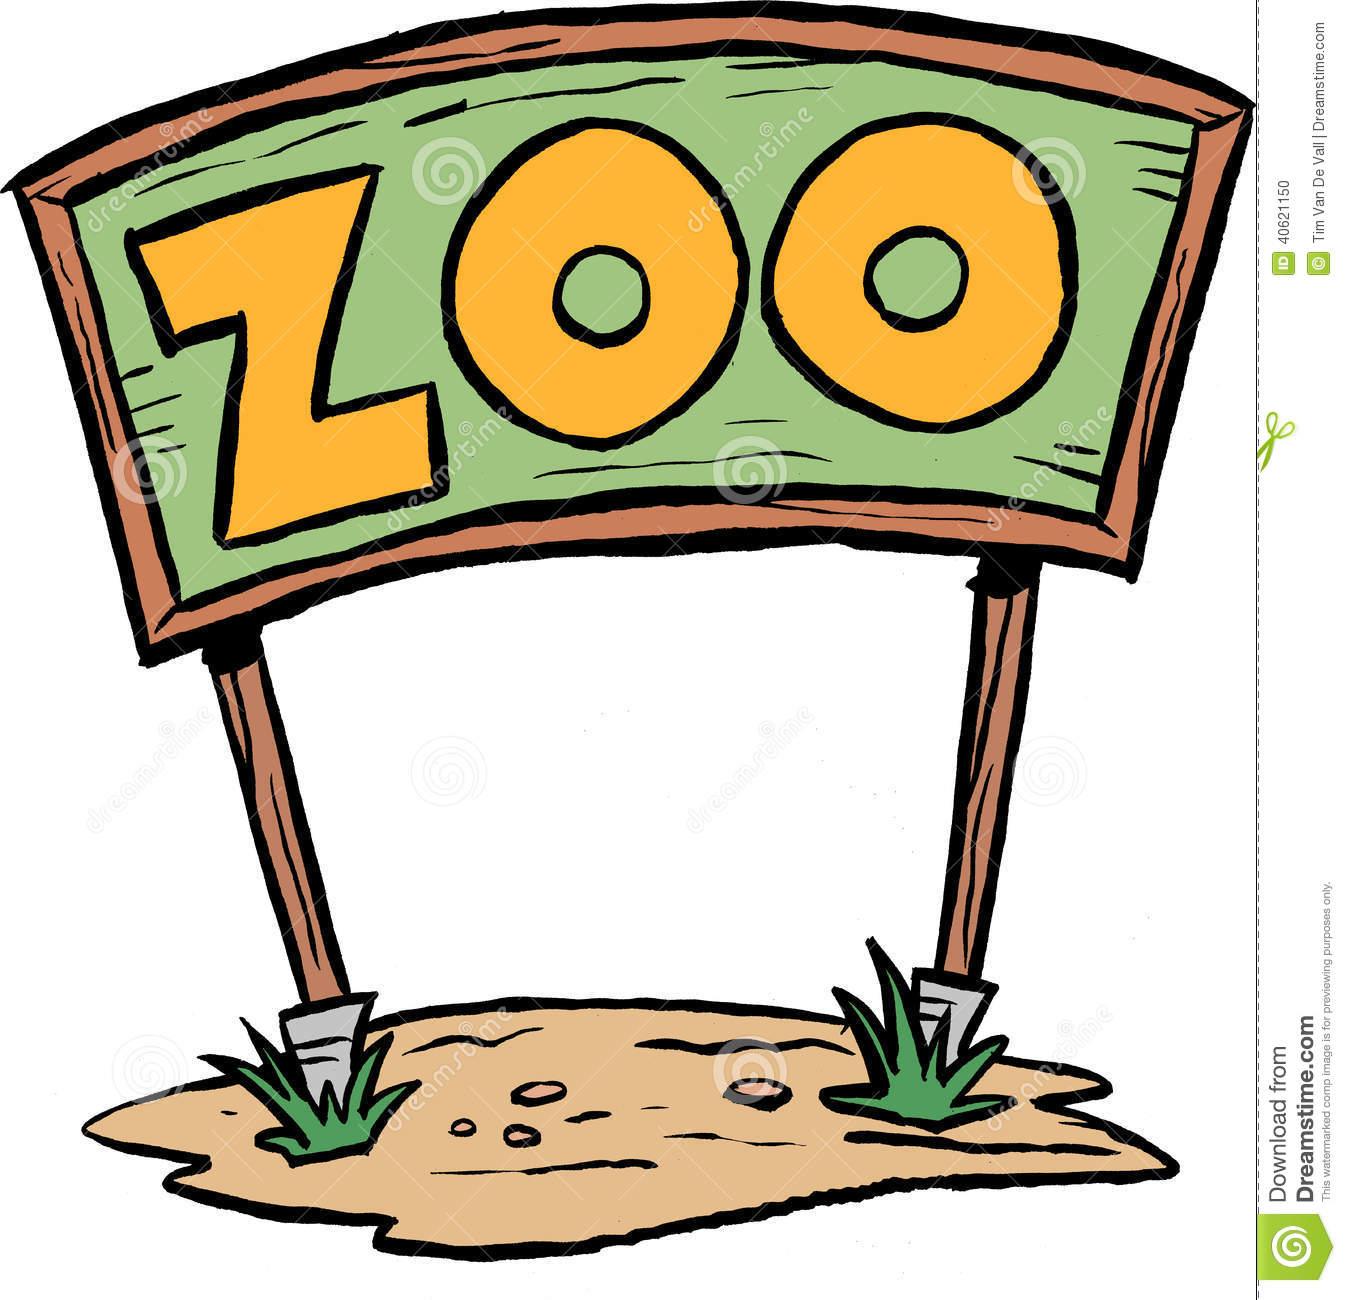 Cartoon Zoo Sign Clipart #1-Cartoon Zoo Sign Clipart #1-8